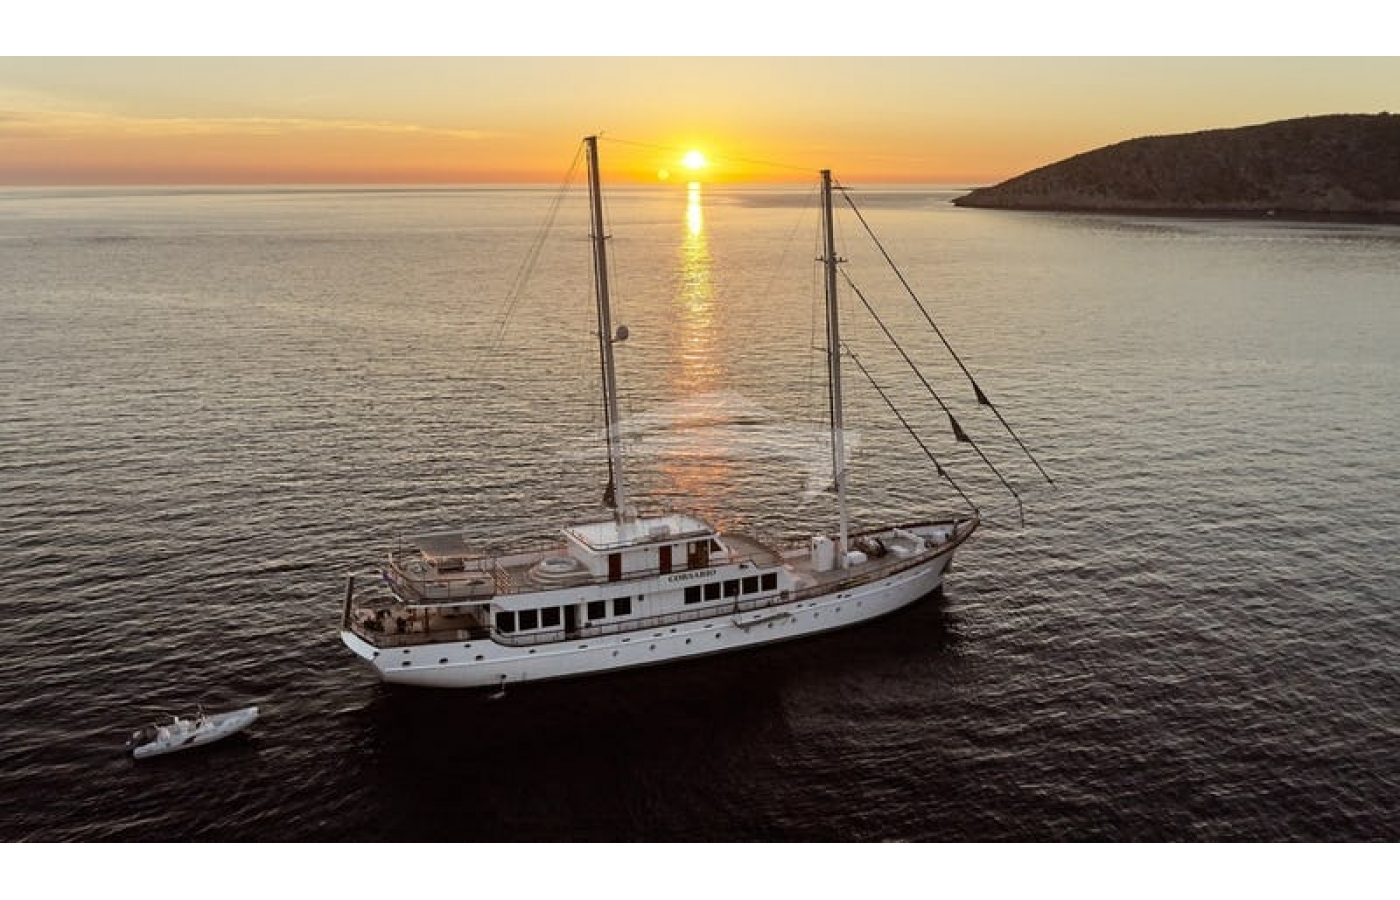 Corsario sailing into the sunset